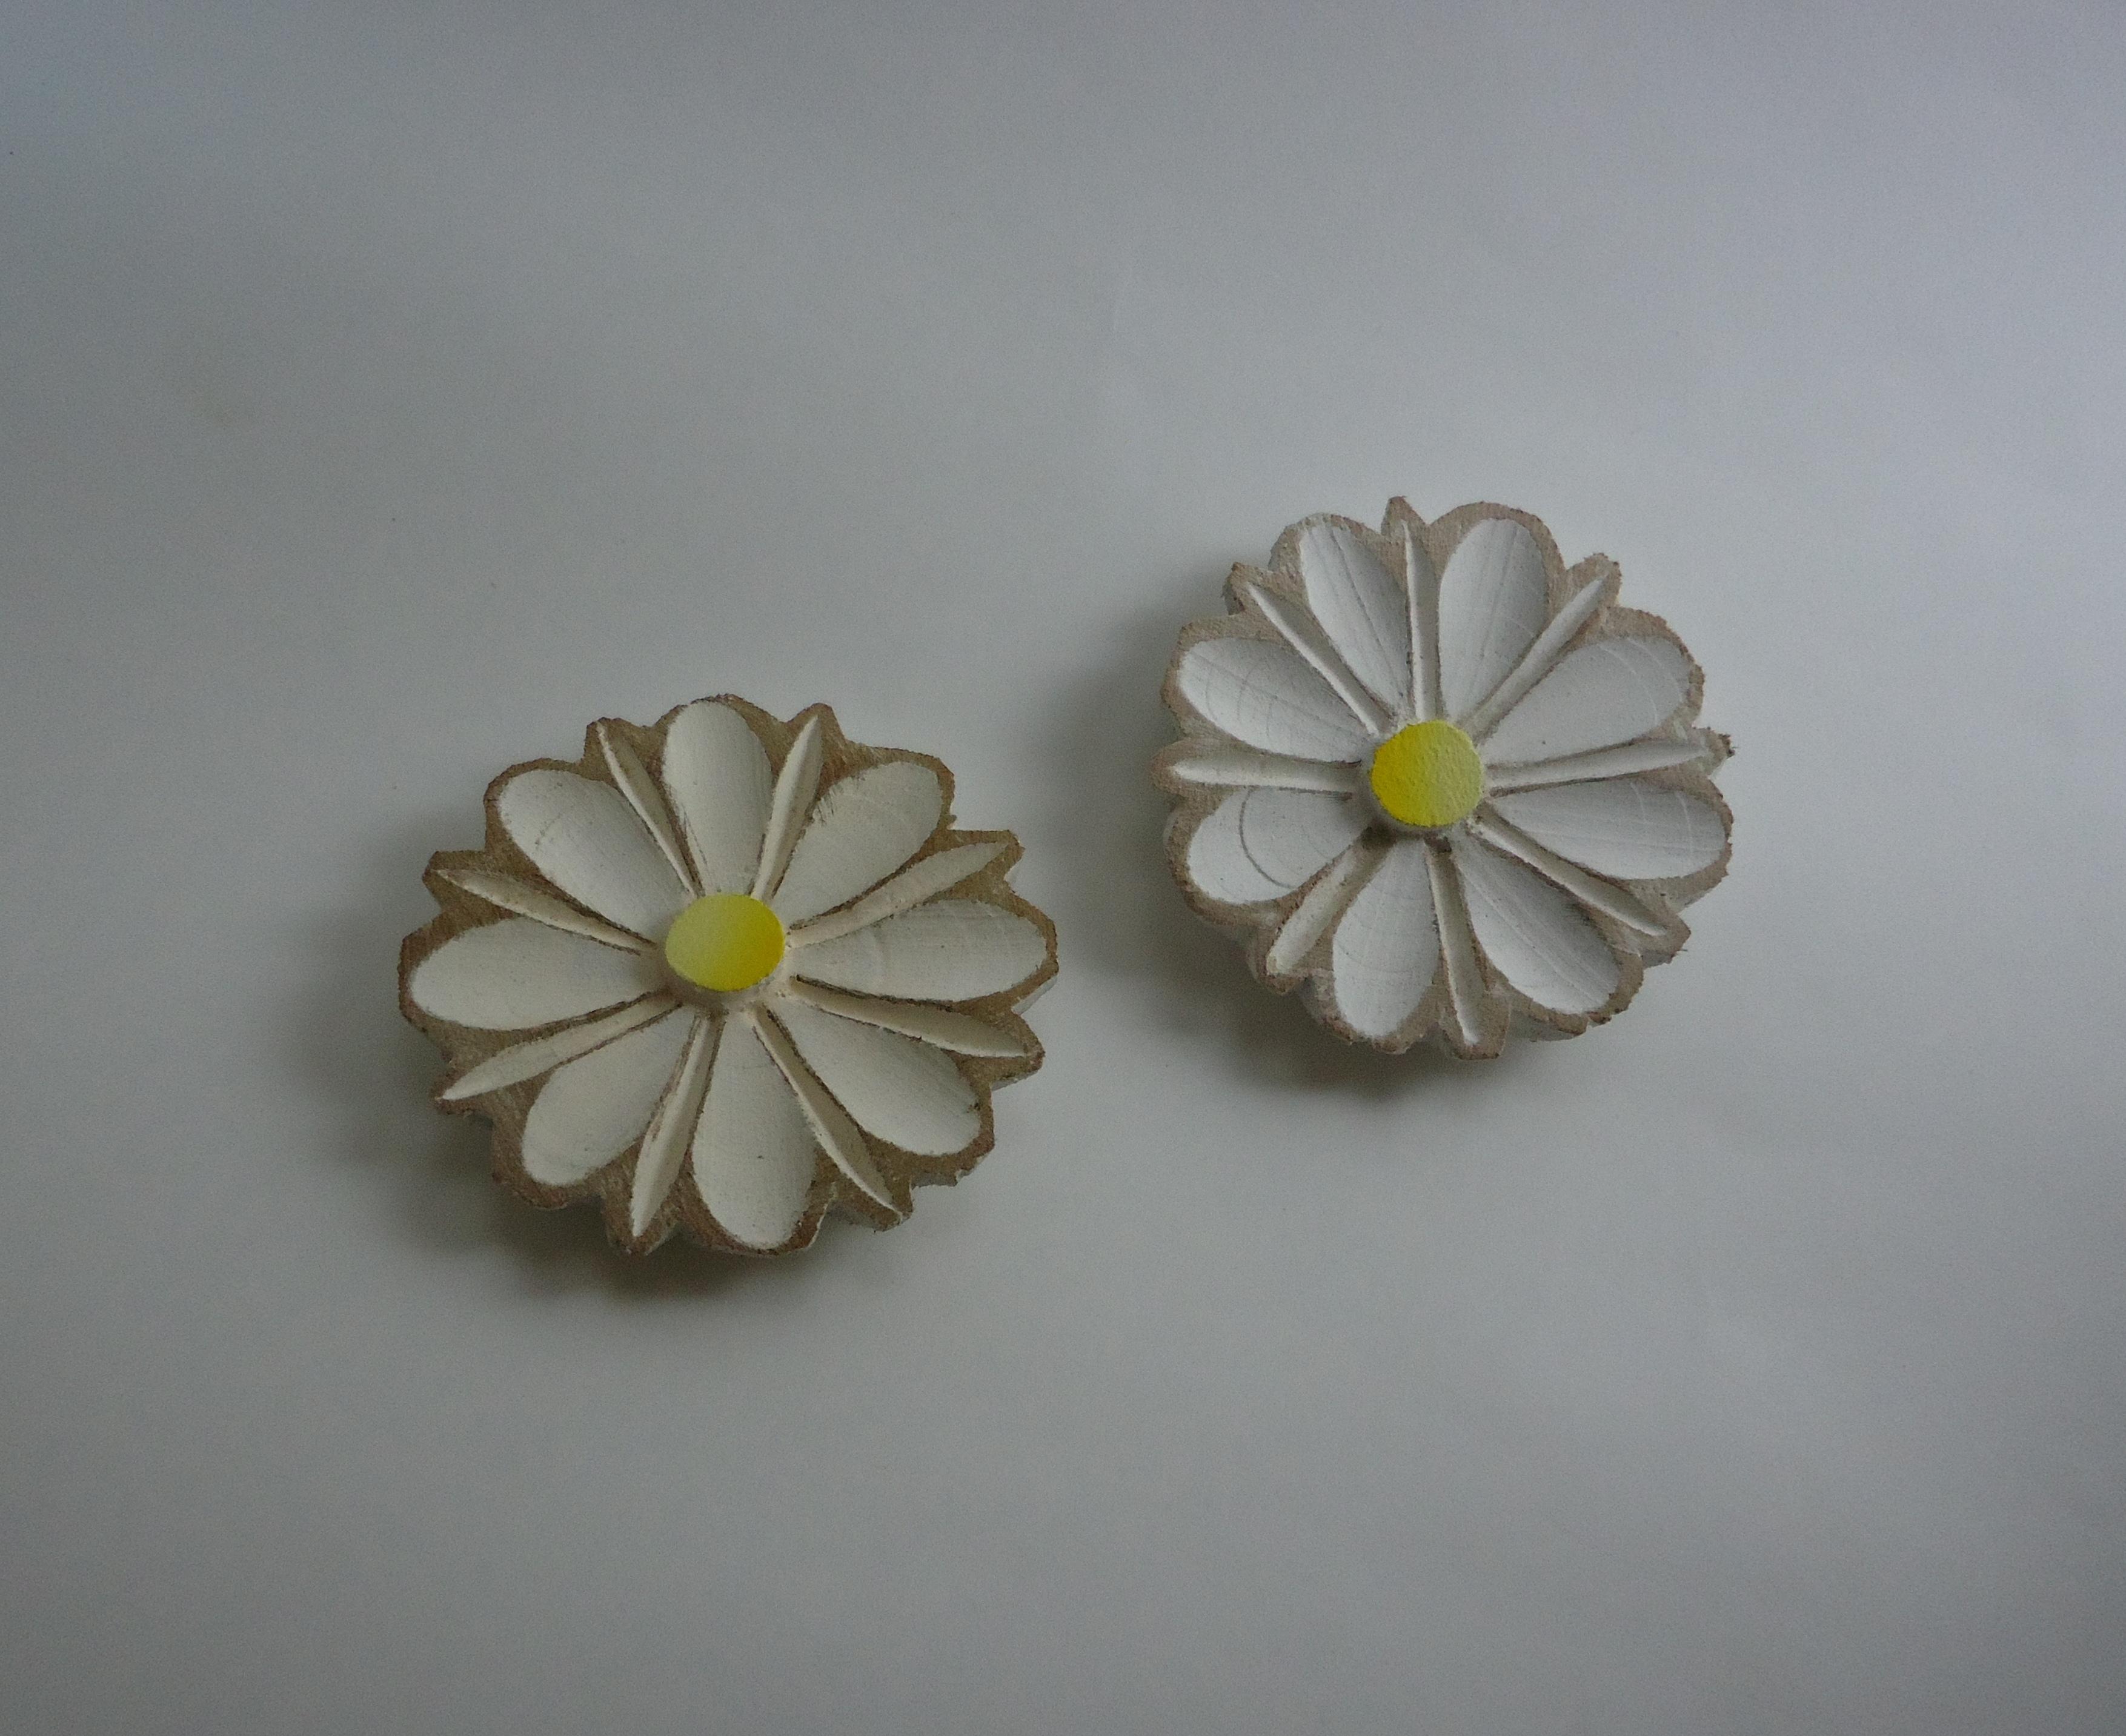 Flores de Madeira Patinada Elo7 #59503A 3509x2865